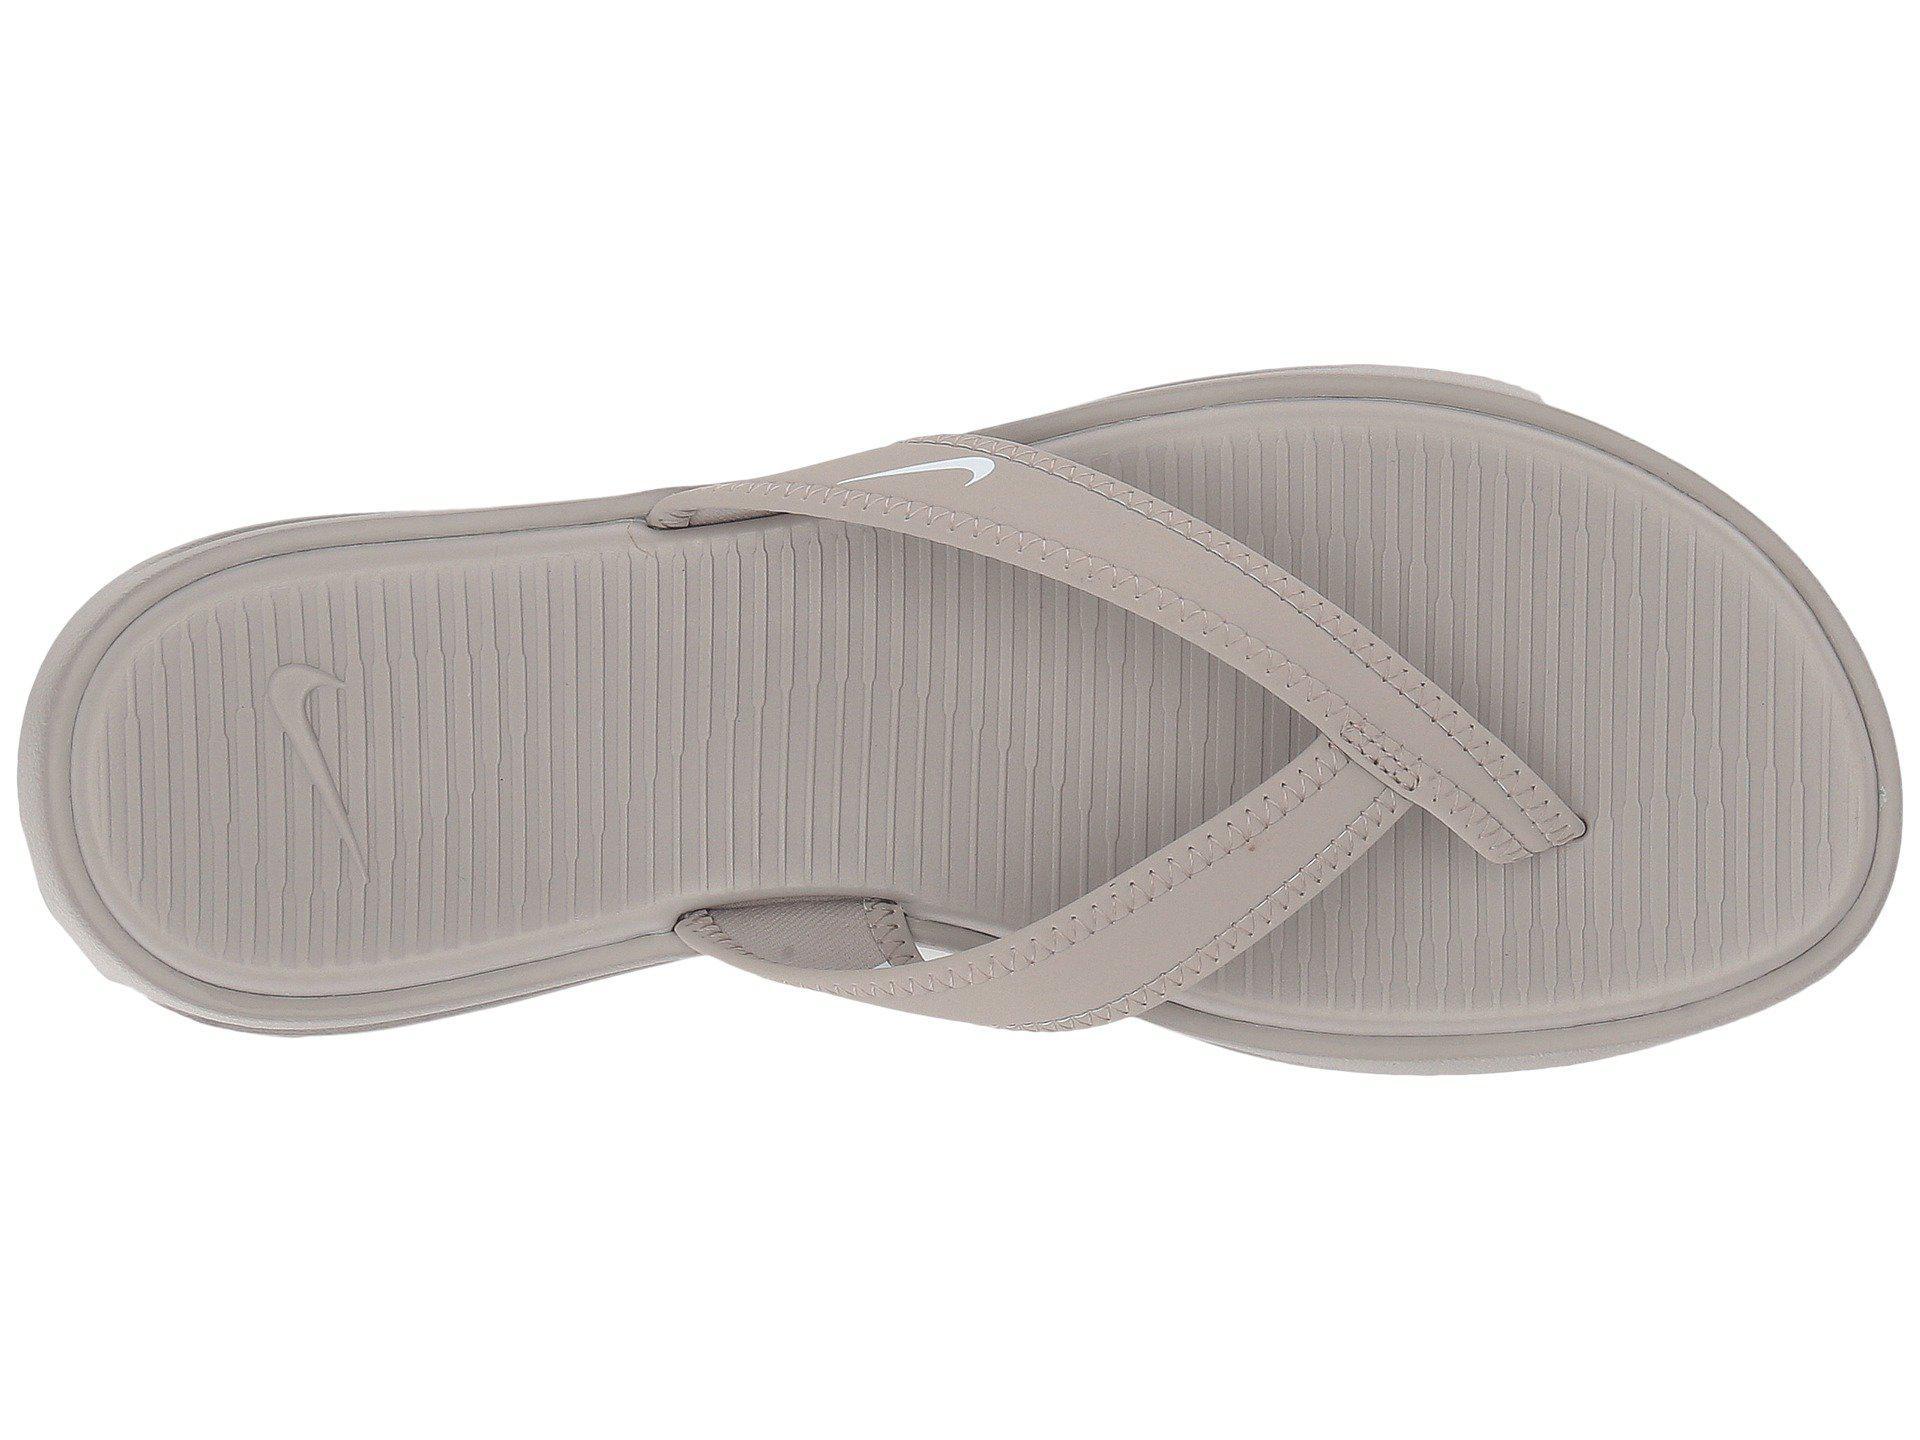 bc3b7972423b Nike - Multicolor Ultra Celso Thong (cobblestone white) Women s Shoes -  Lyst. View fullscreen